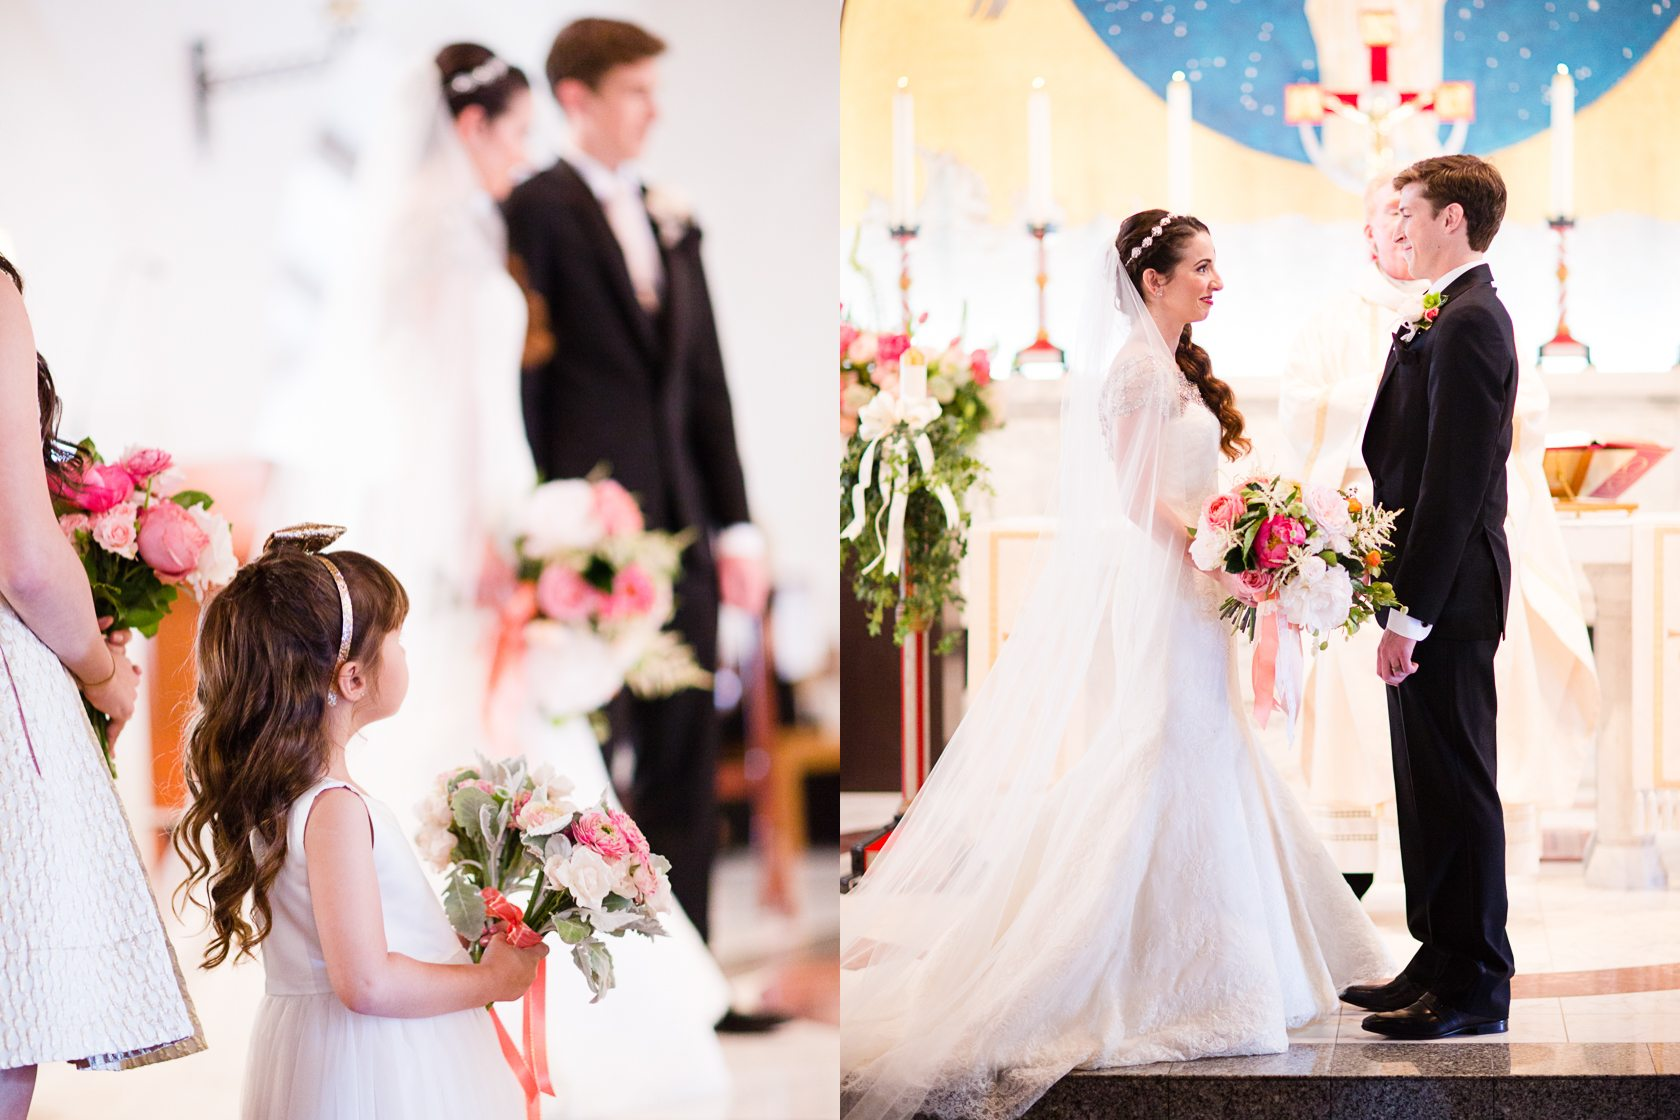 Darlington_House_Wedding_068.jpg